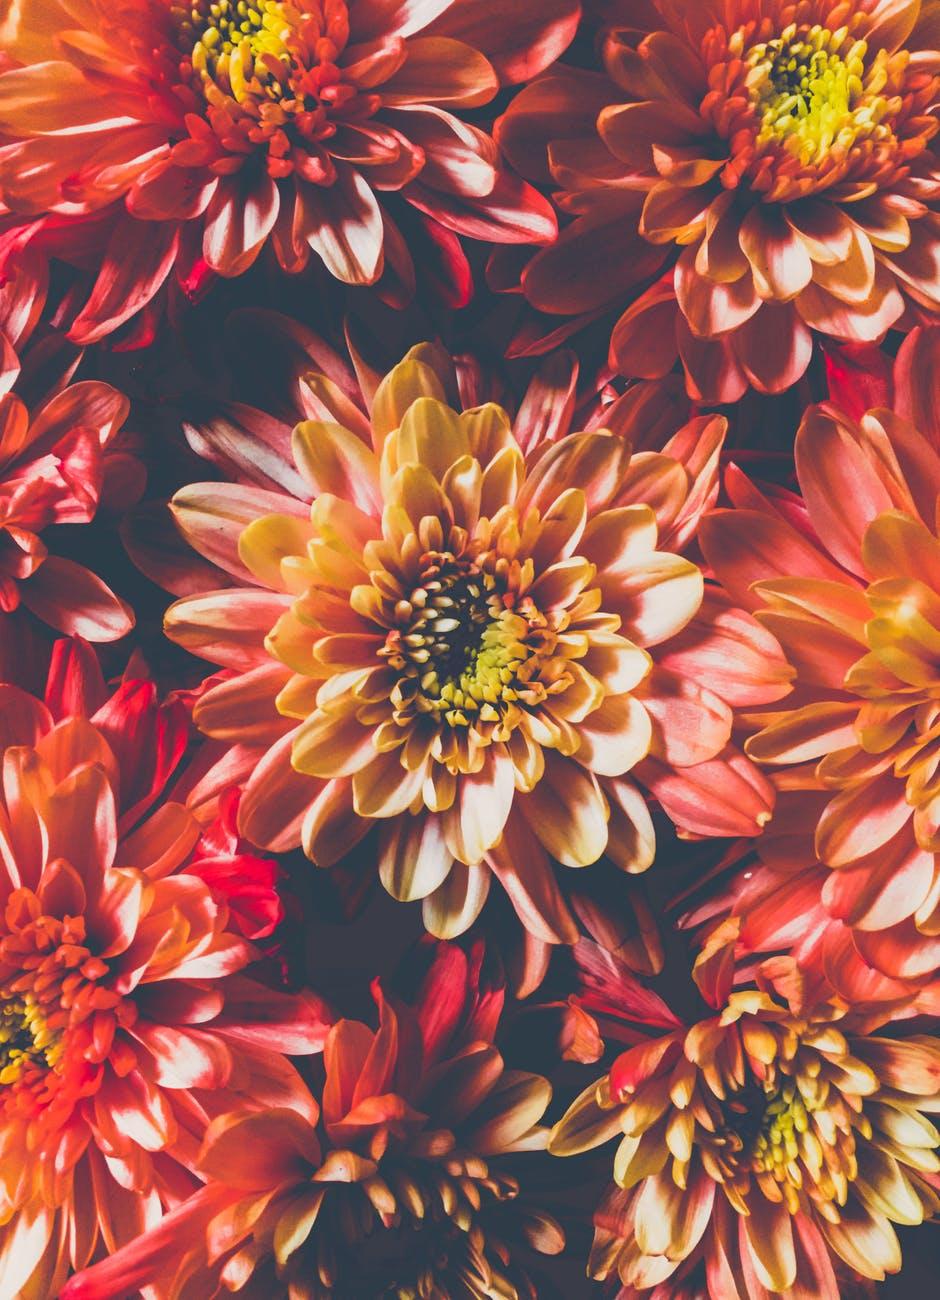 Should you write what you know, blog post by Aspasia S. Bissas, aspasiasbissas.com, write, writing, writers, am wtiting, writing tips, dahlias, flowers